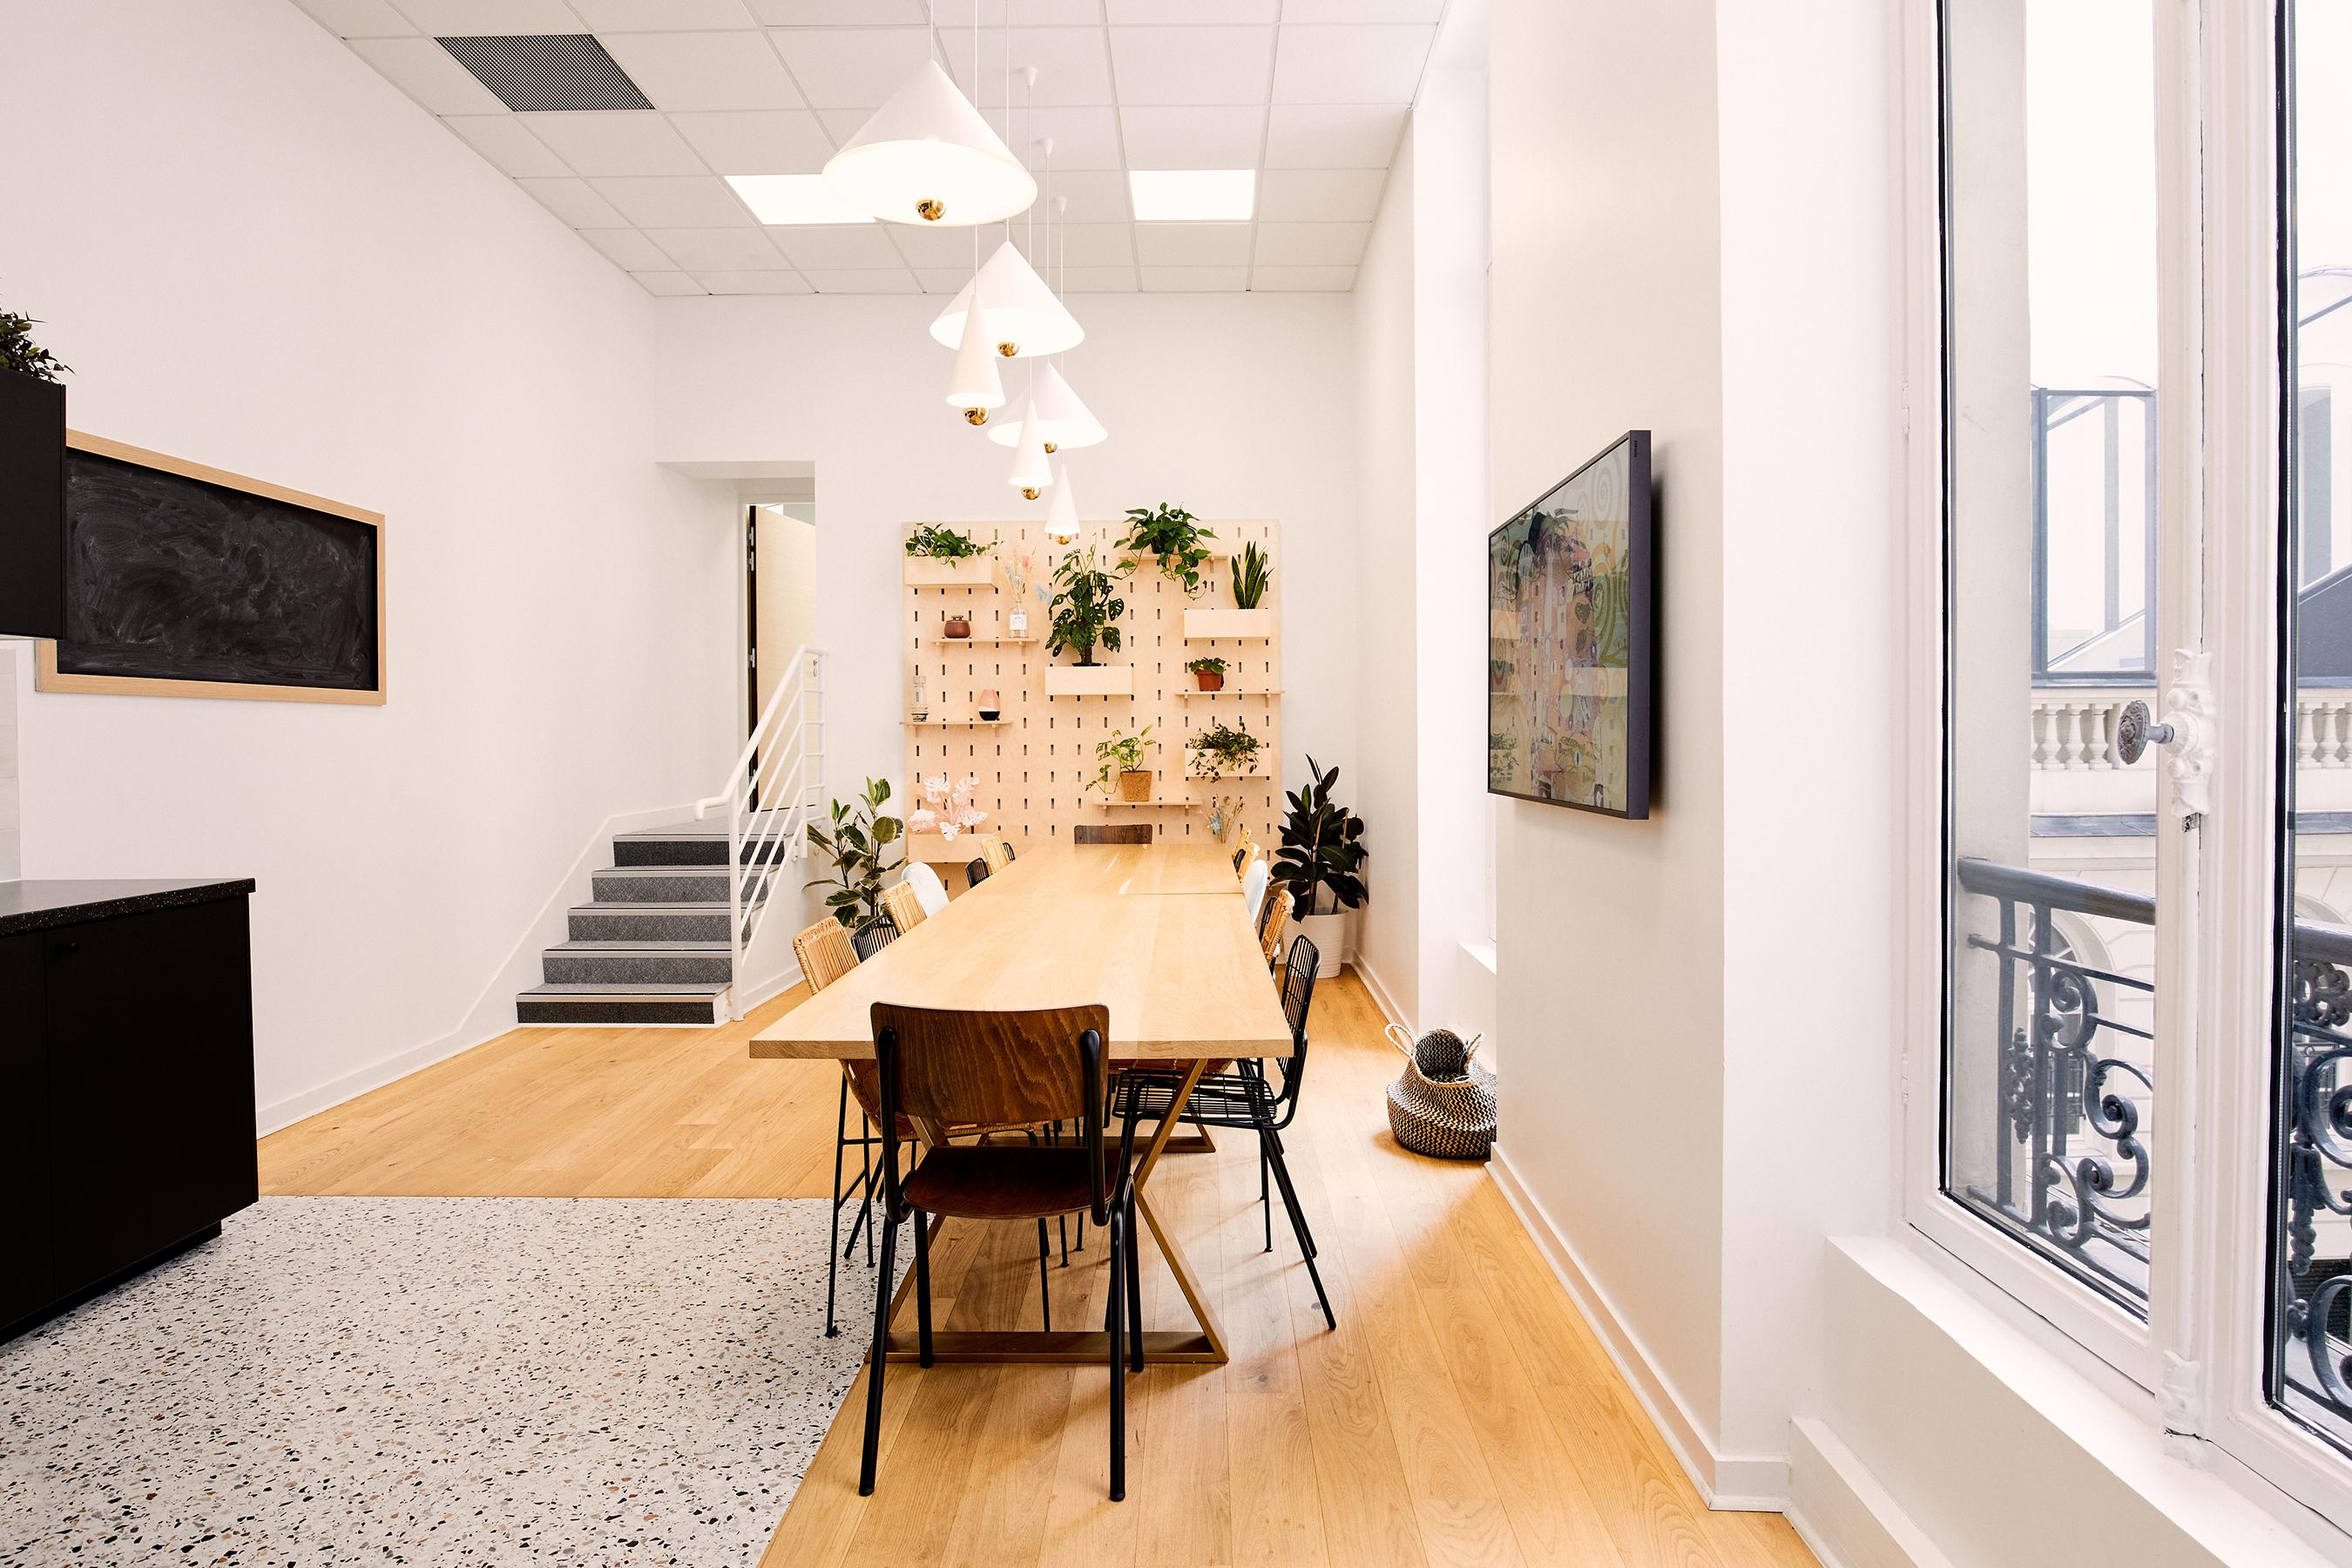 Aménagement espace bureau - salle à manger avec mur fleuri